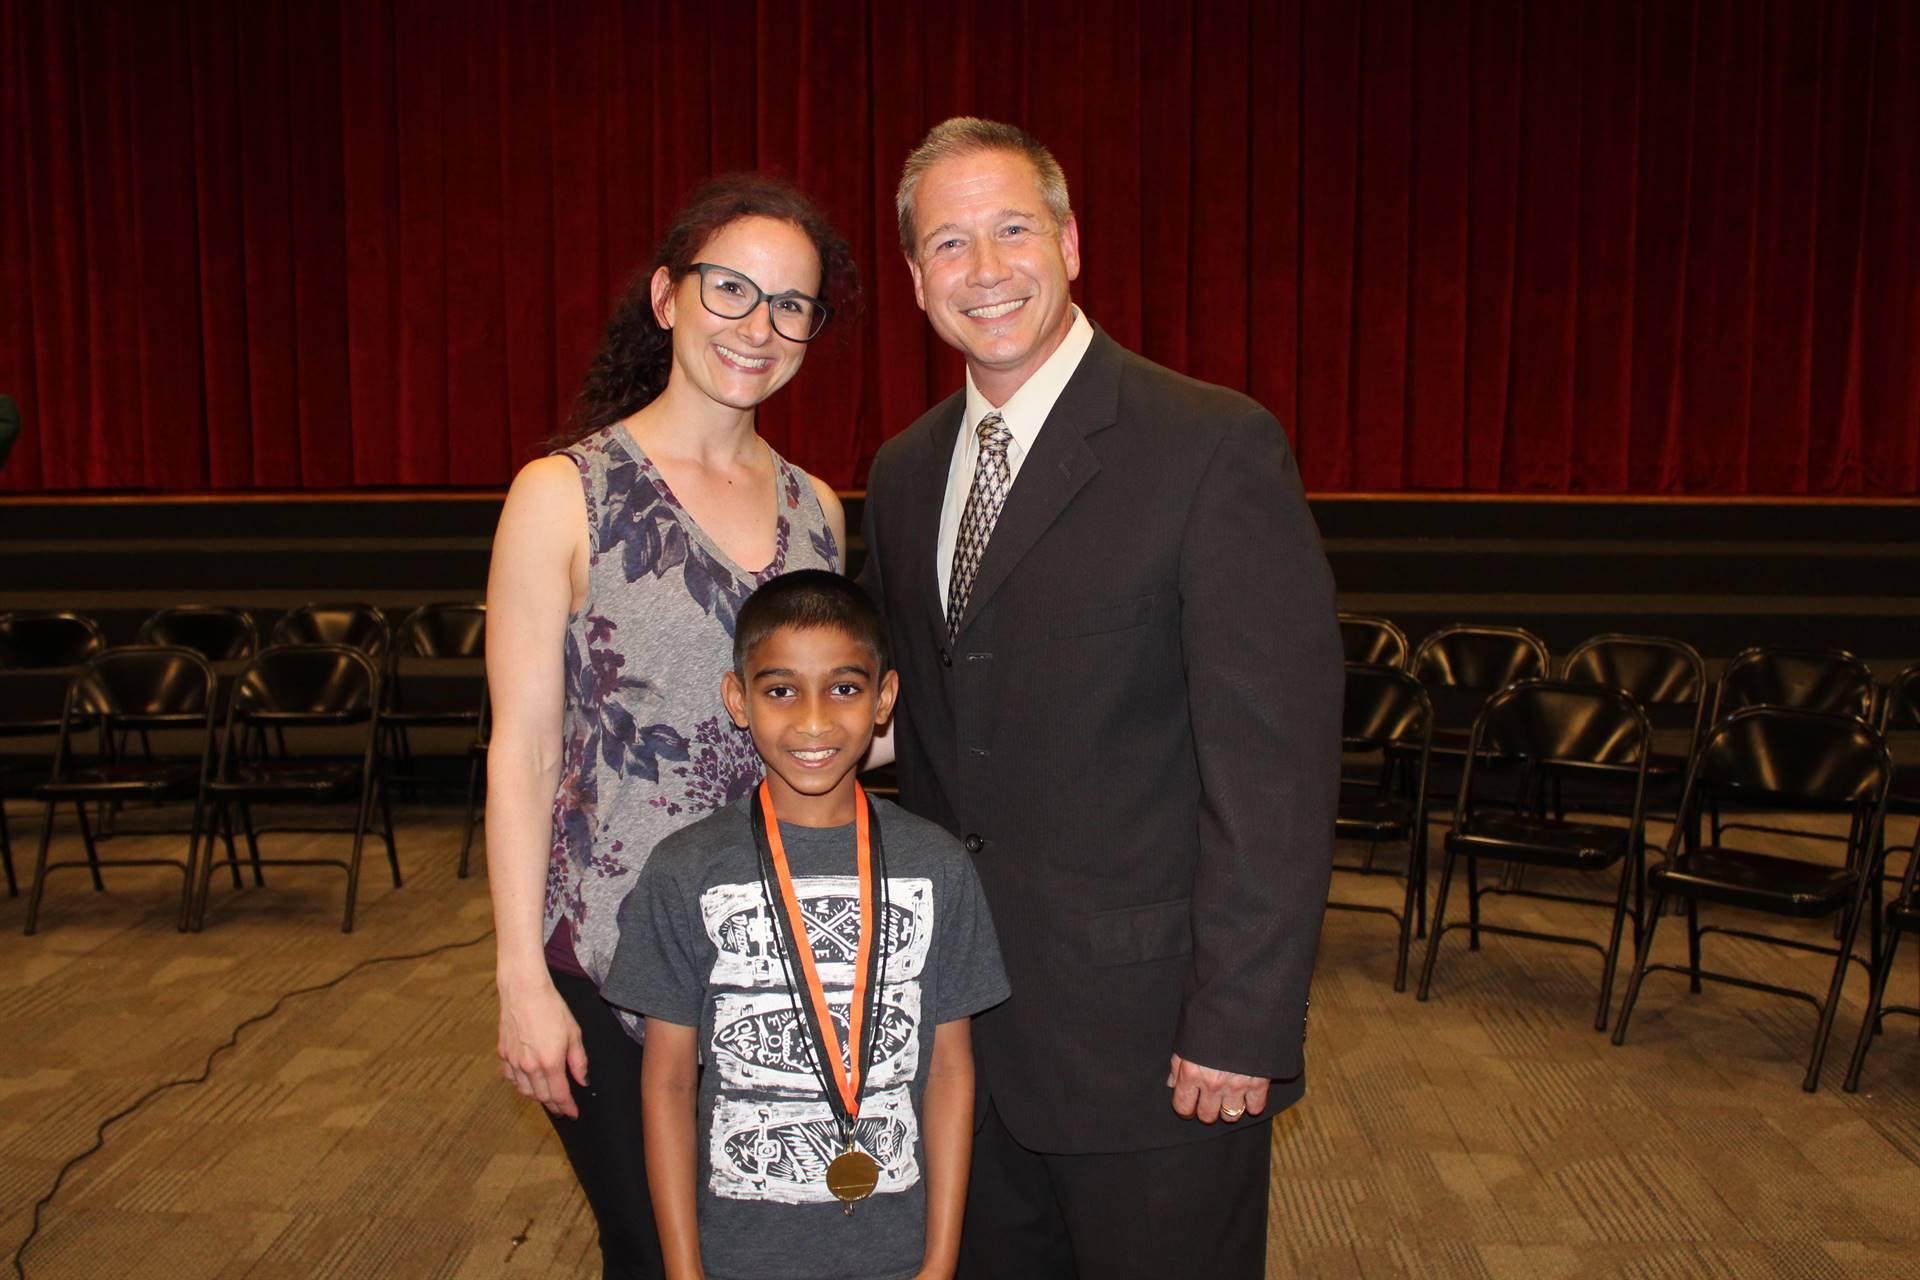 The Winner, his teacher and principal